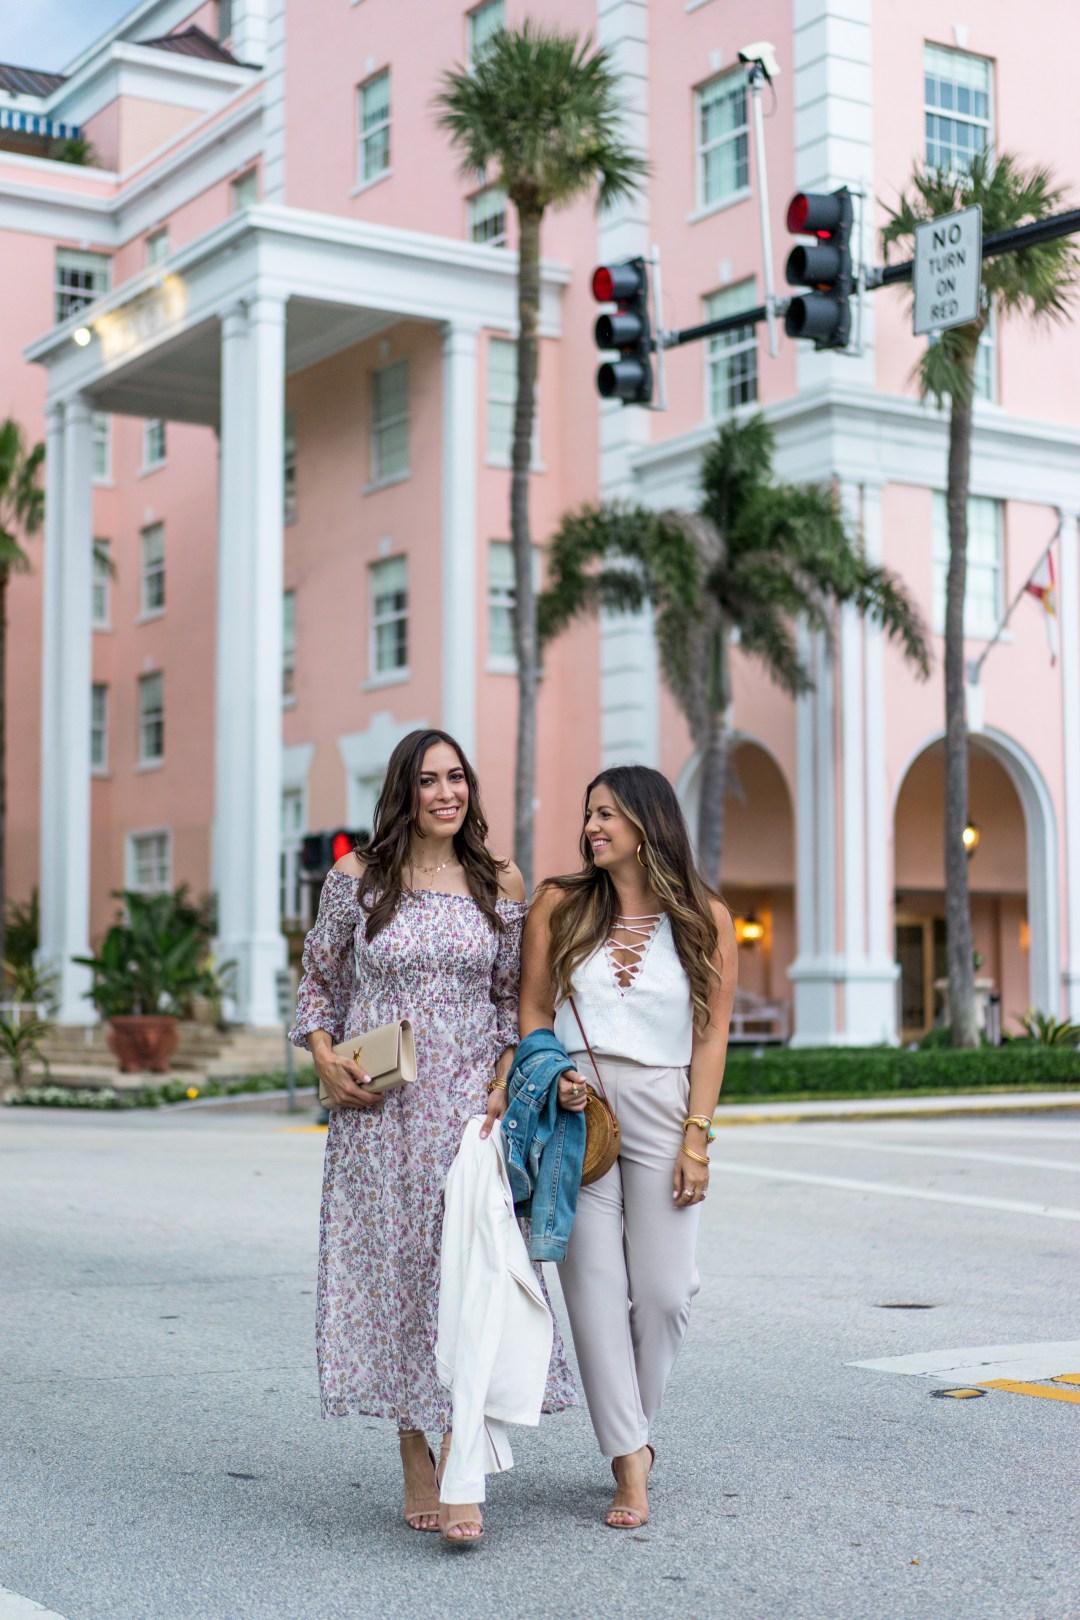 palm beach, florida bloggers, Sunflowers and Stilettos, best south Florida hotel